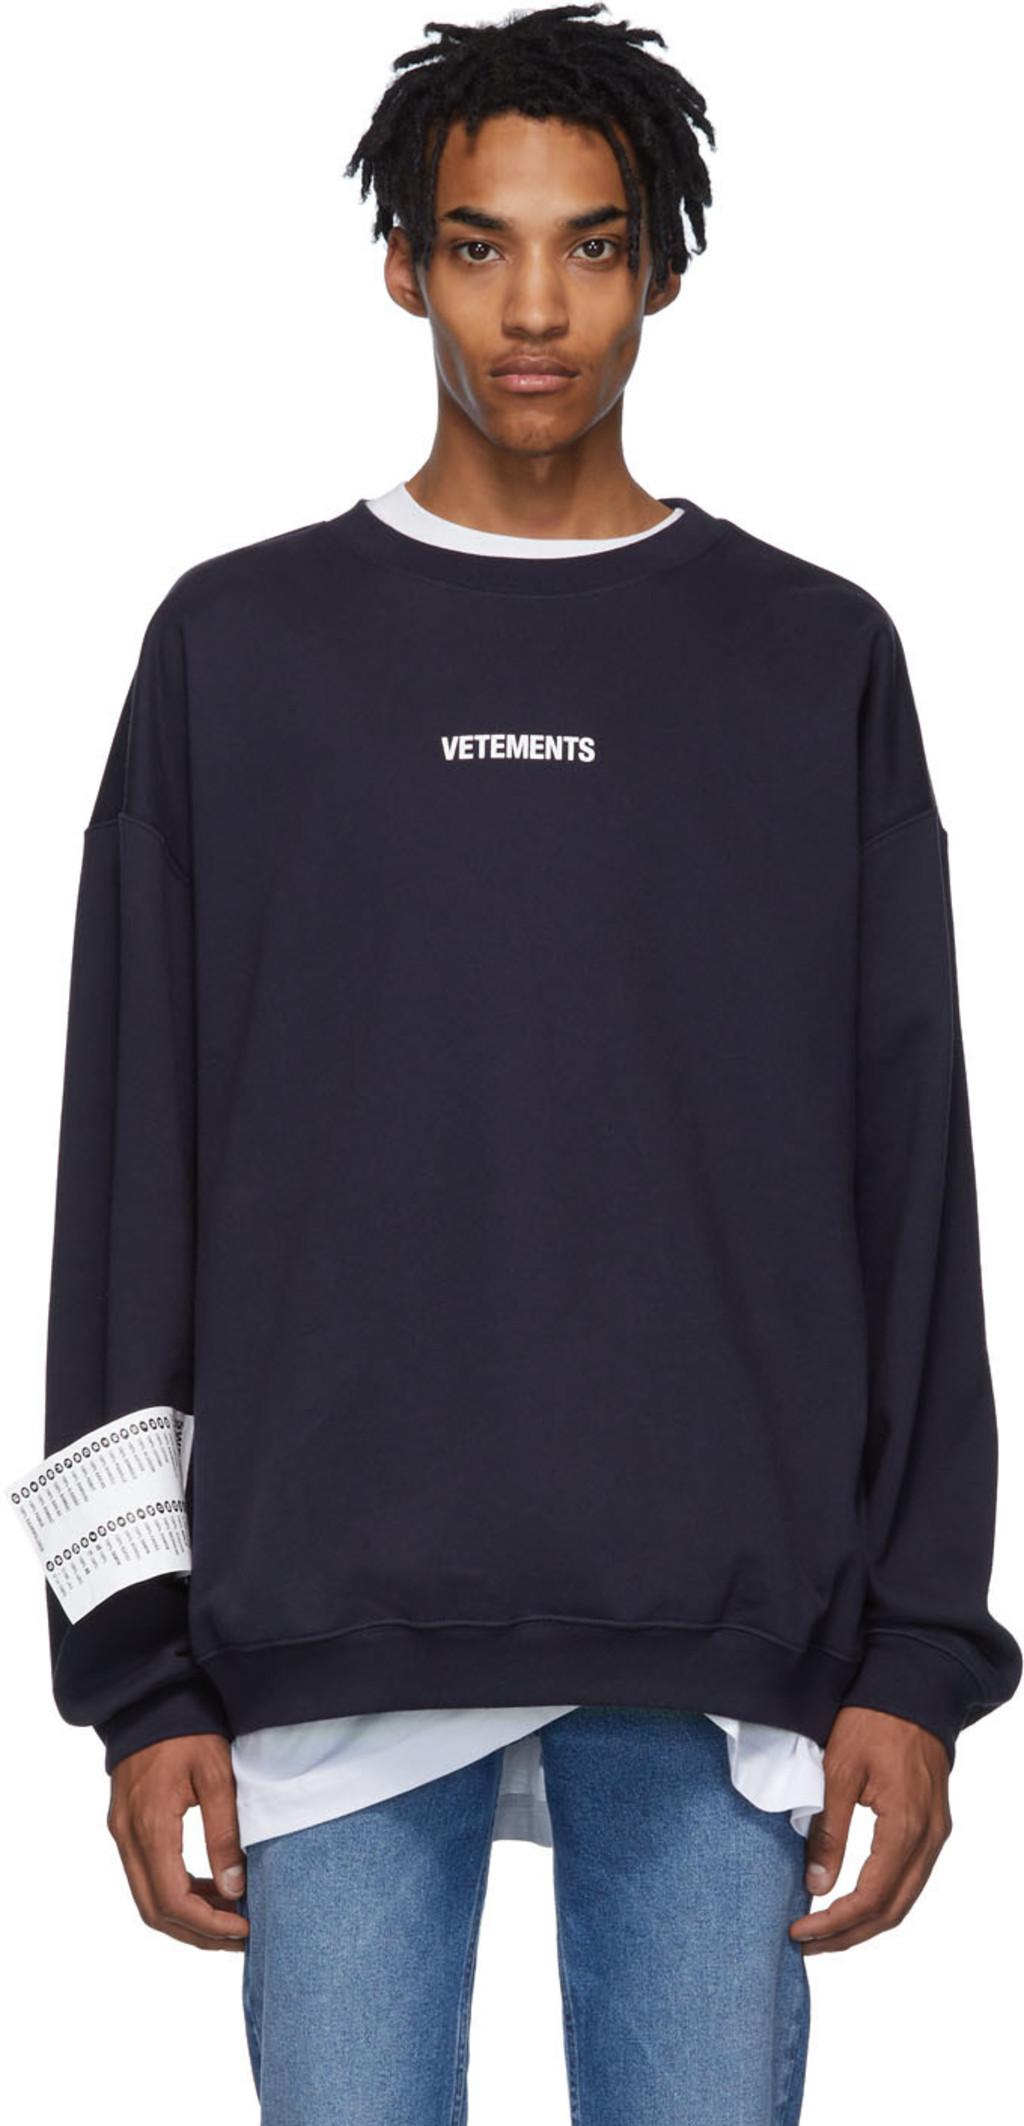 042c9f48 Vetements for Men SS19 Collection   SSENSE